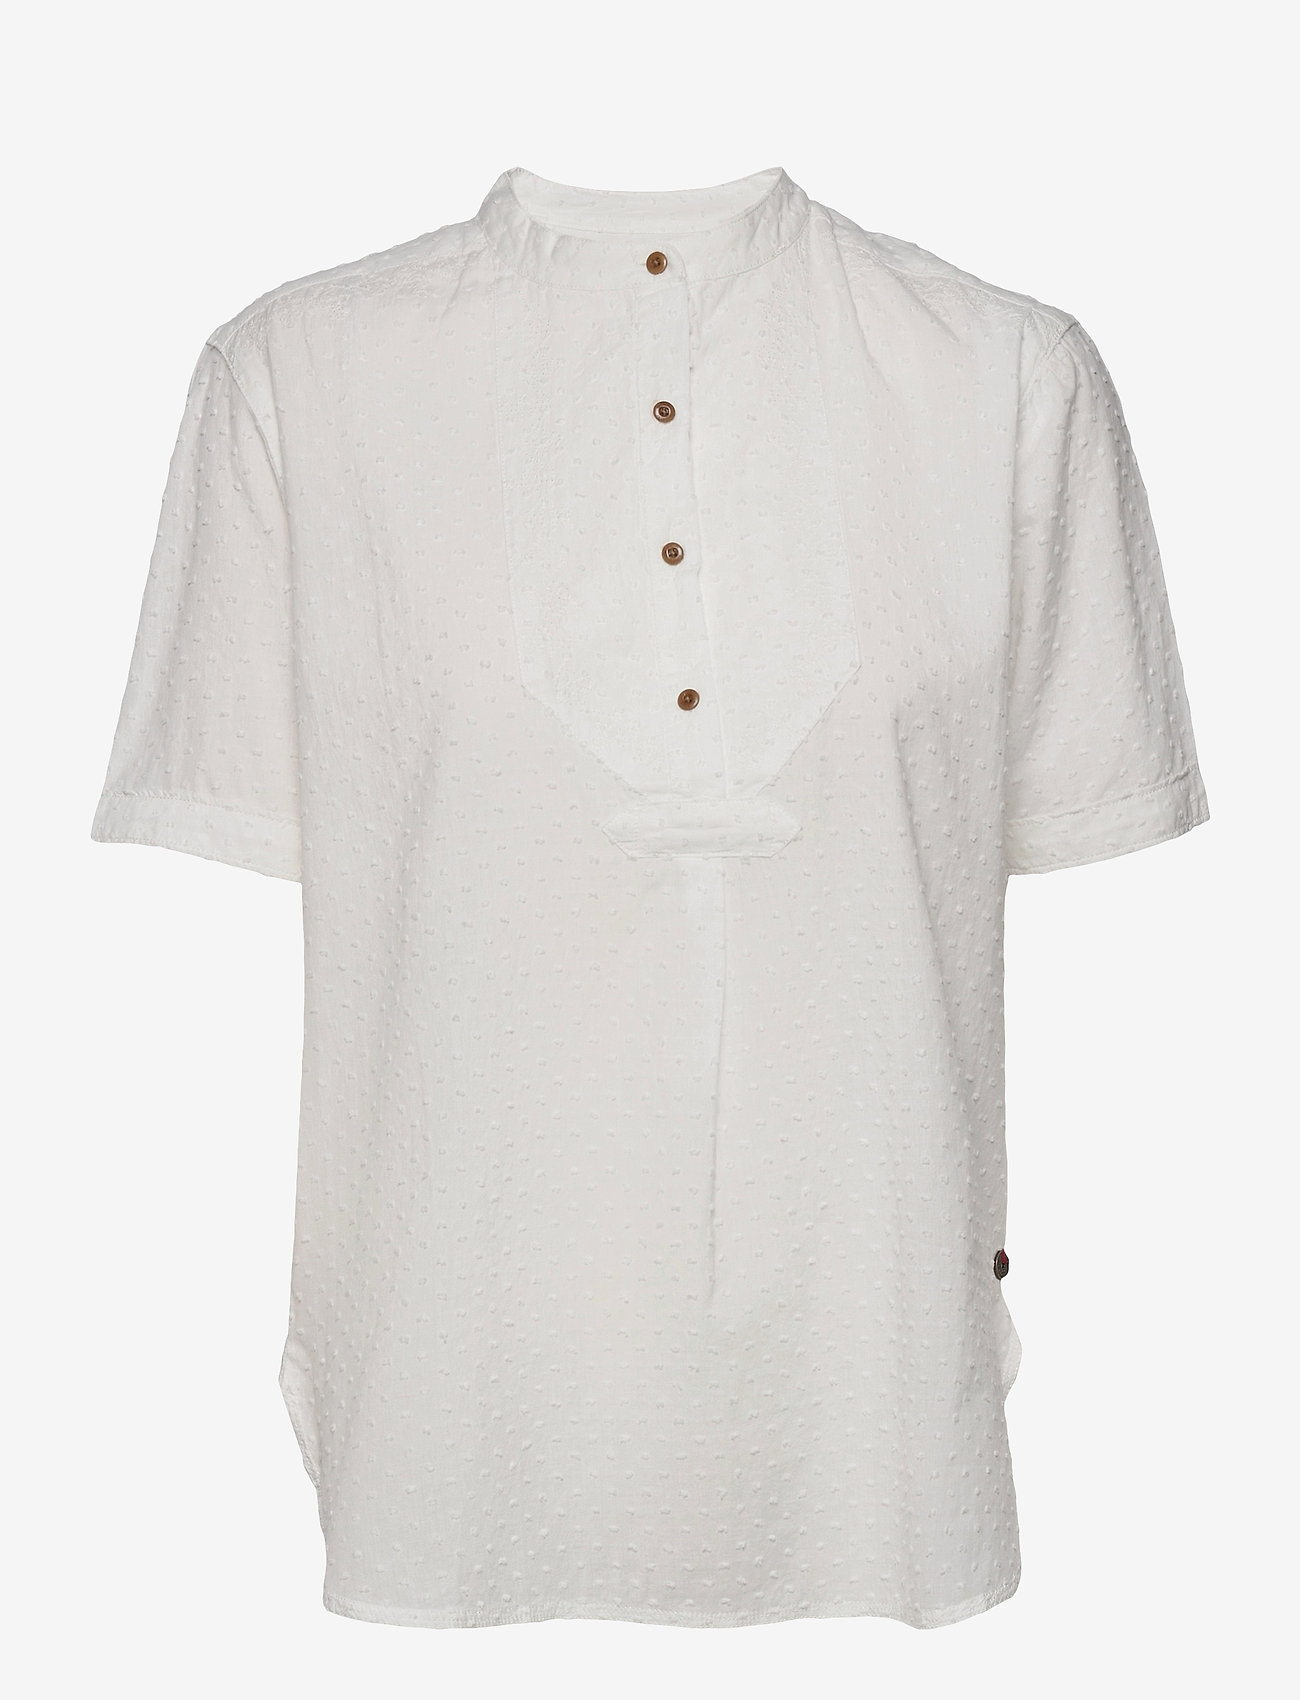 Superdry - GRANDAD BLOUSE - short-sleeved blouses - off white - 0